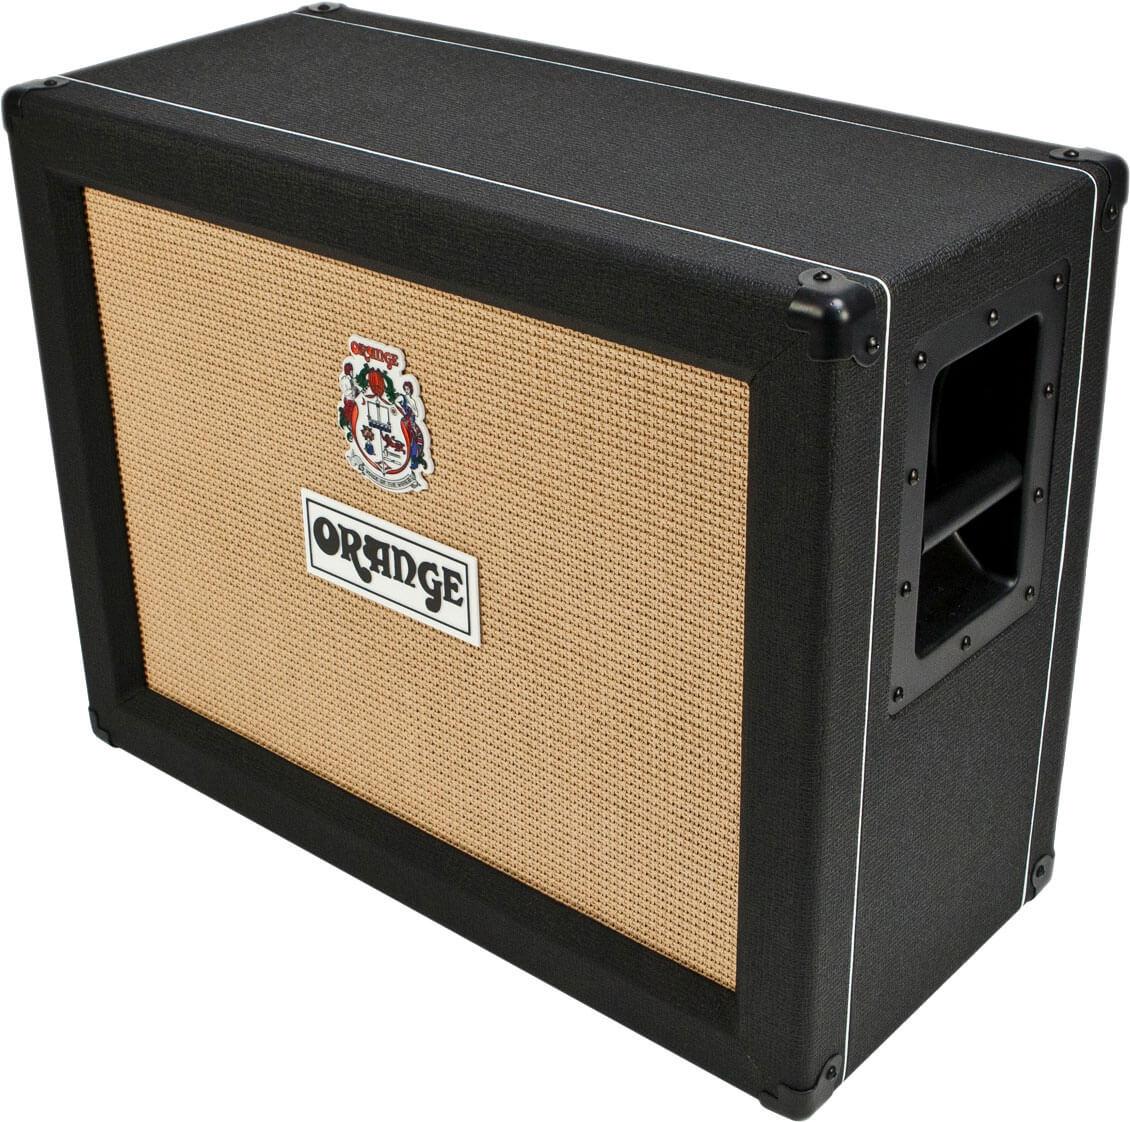 Caja Acústica Amplificador Guitarra Orange Ppc212Ob Bk